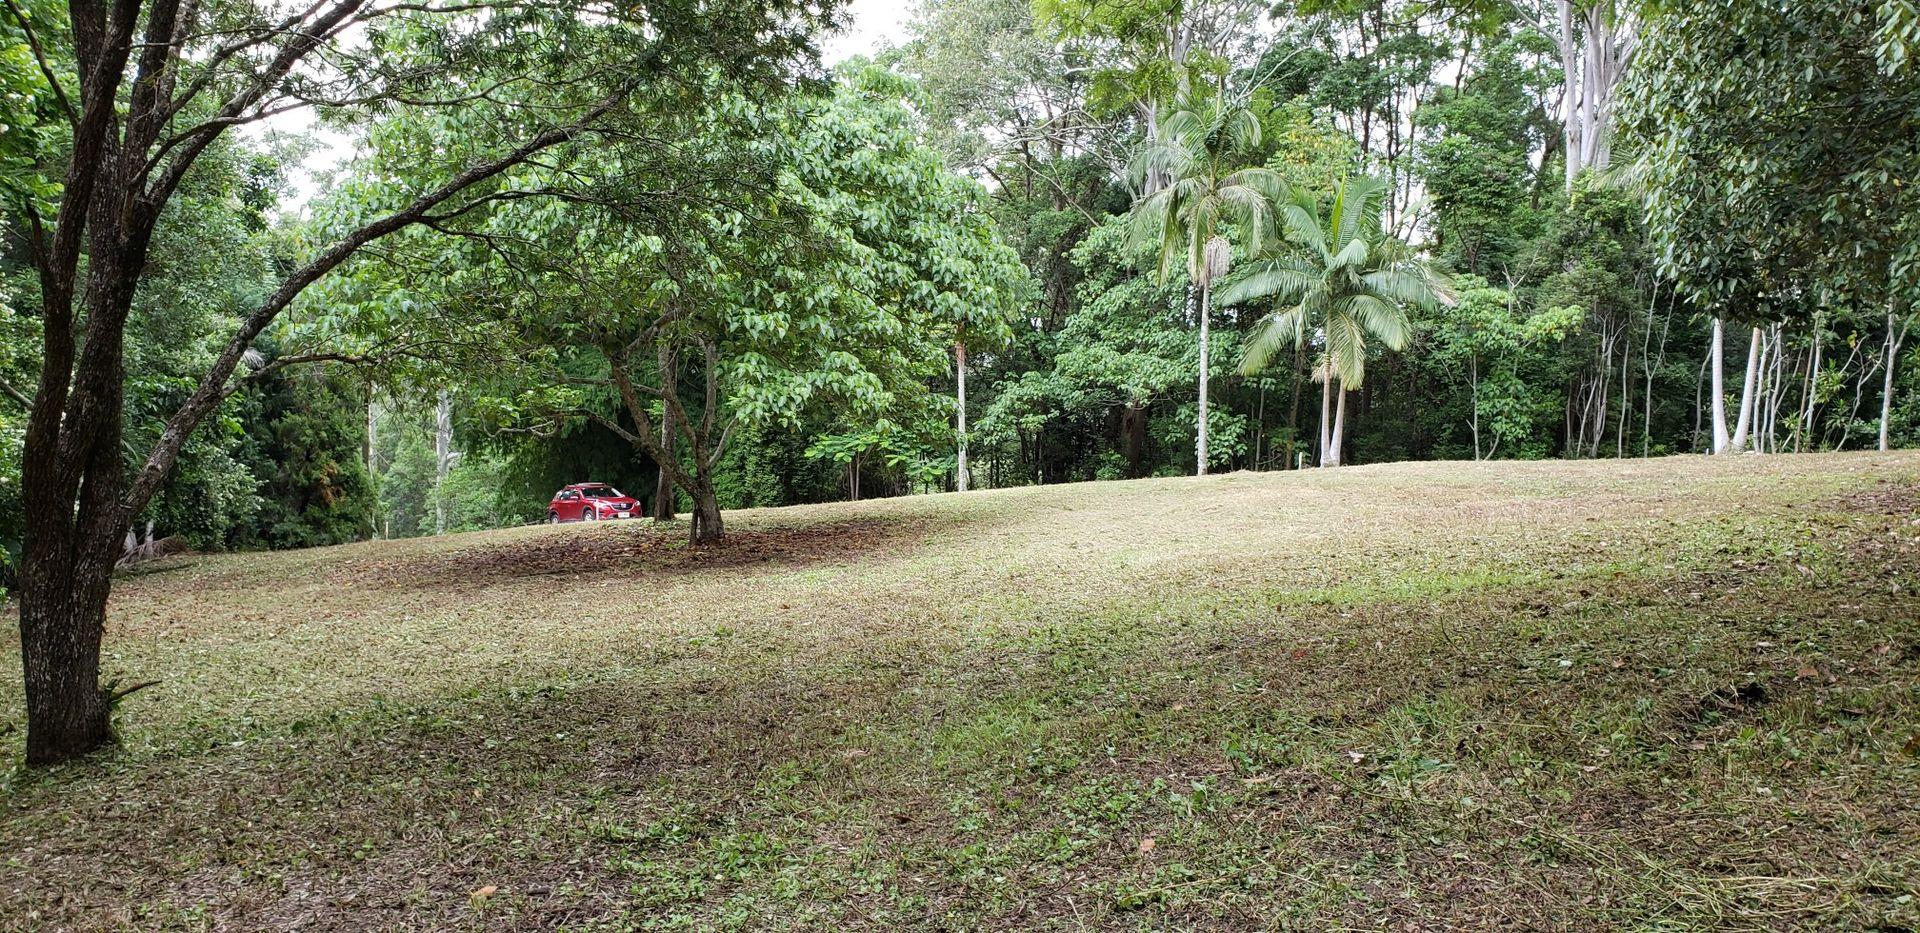 163 Tallgum Avenue, Doonan QLD 4562, Image 0